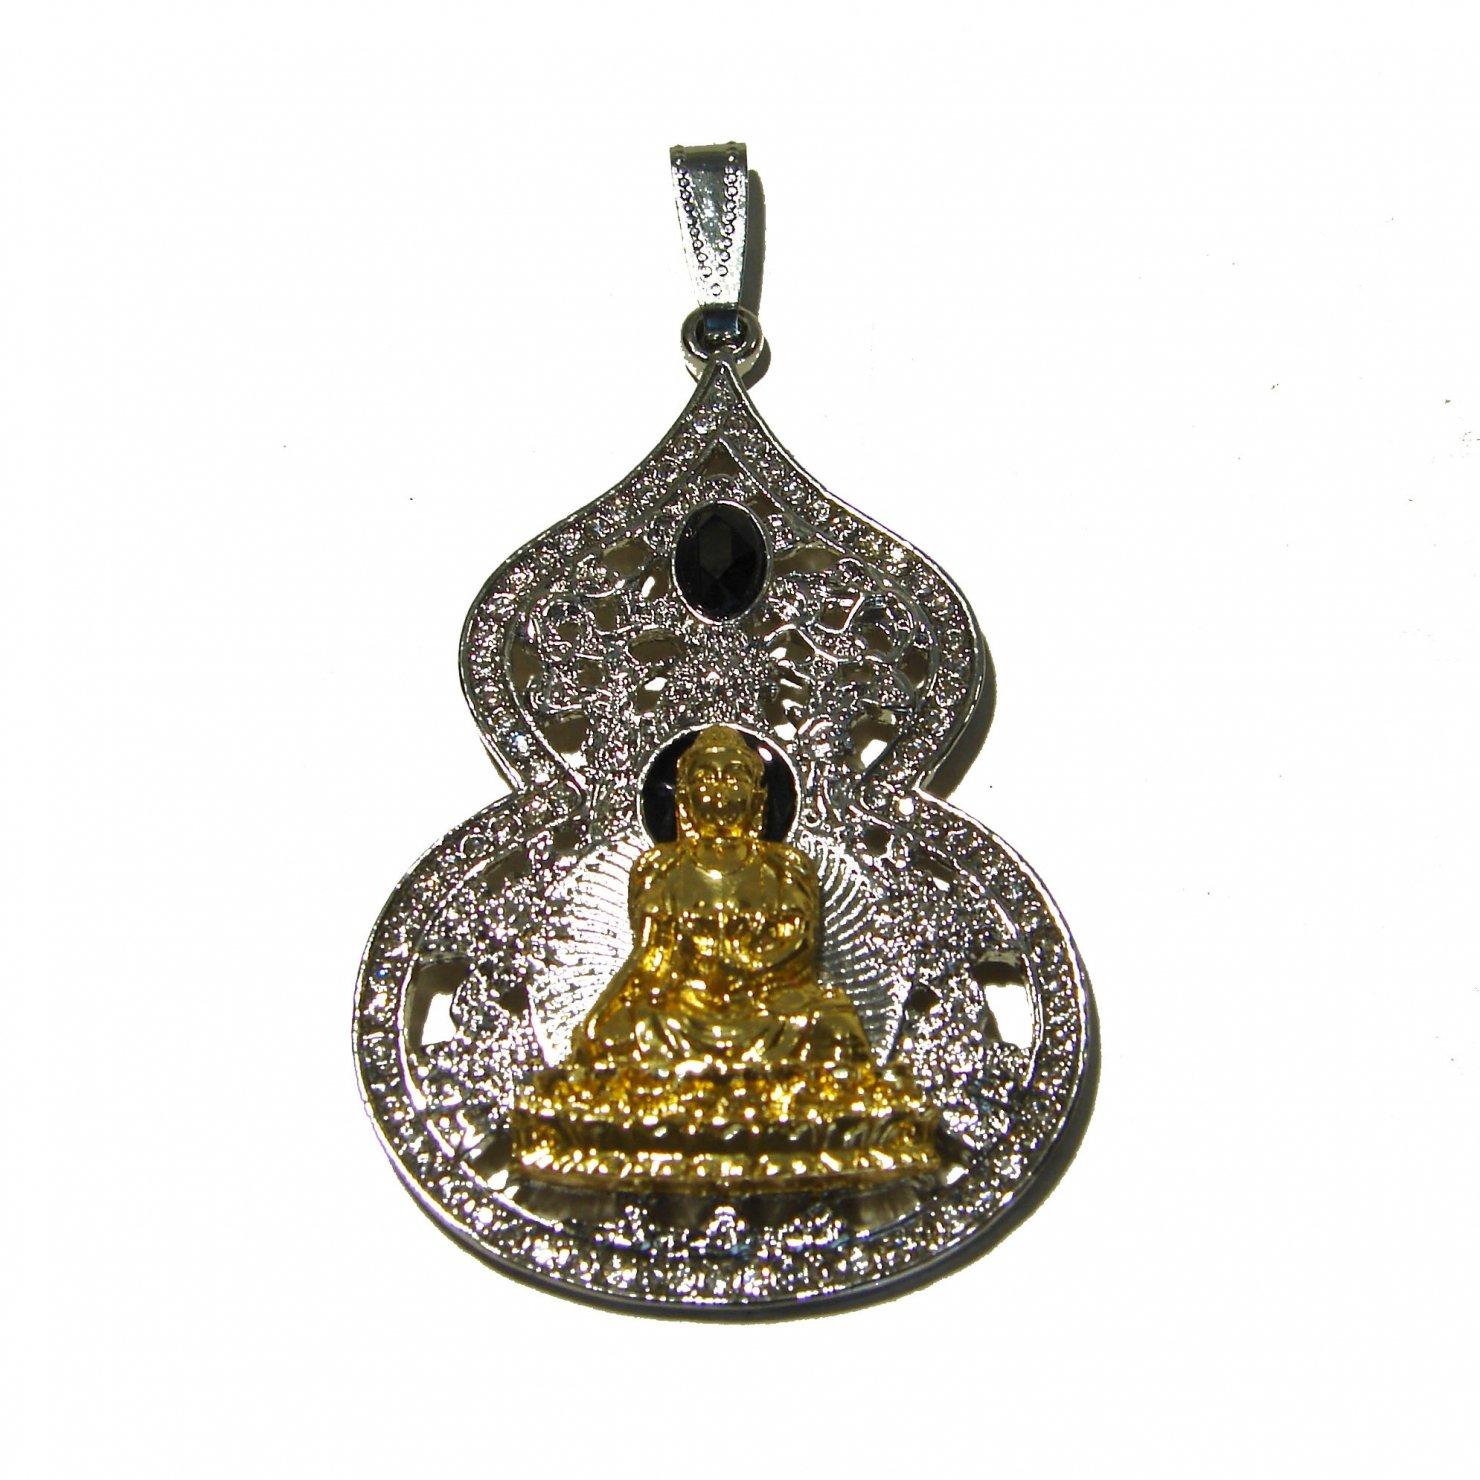 Amazon.com: Medicina Buda Wu Luo colgante: Jewelry